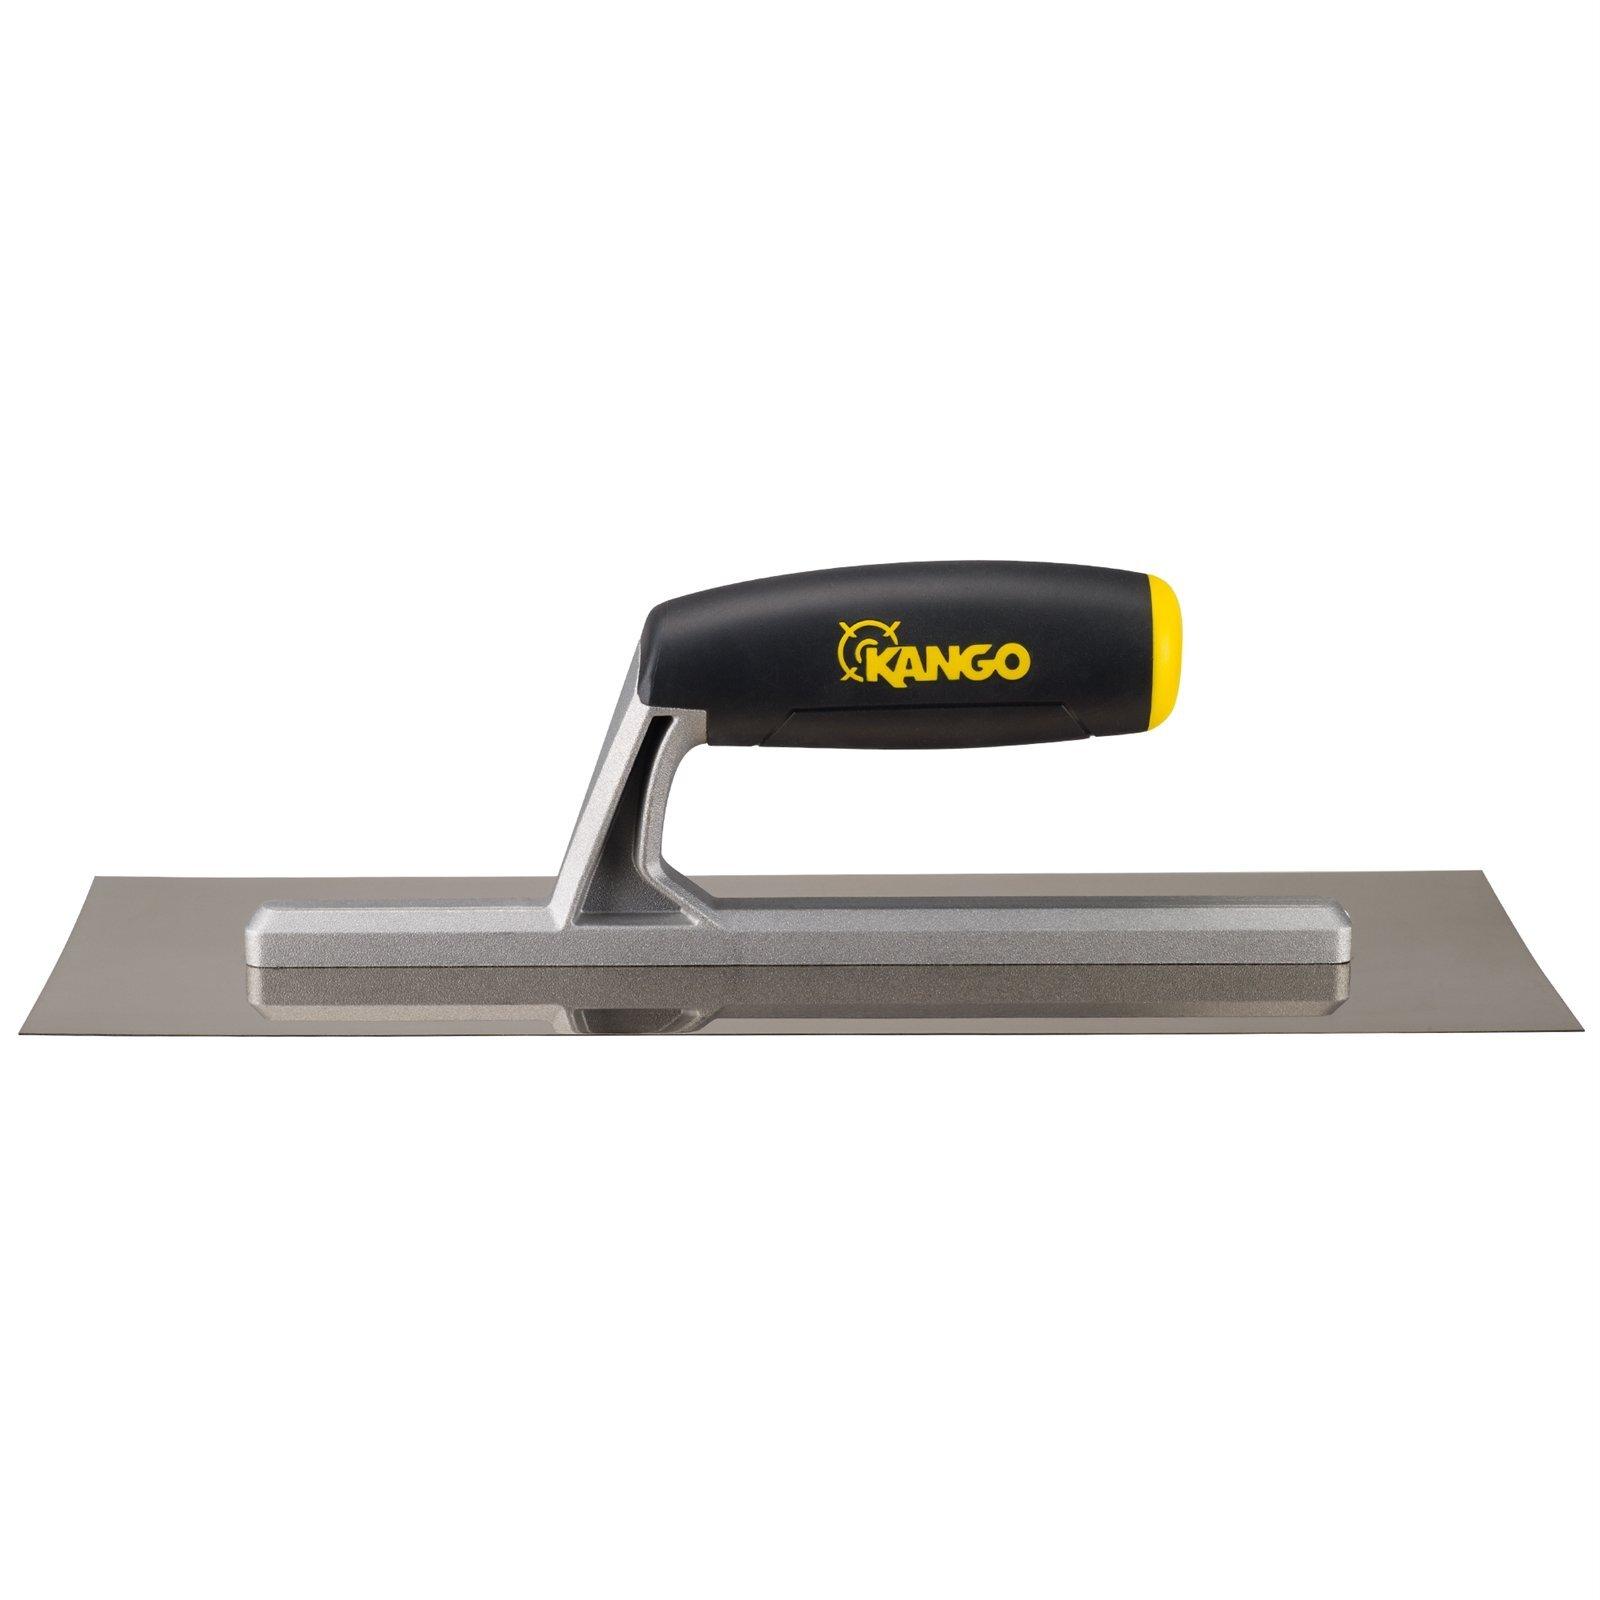 Kango 330mm Gold Stainless Steel Pre-Worn Plaster Trowel